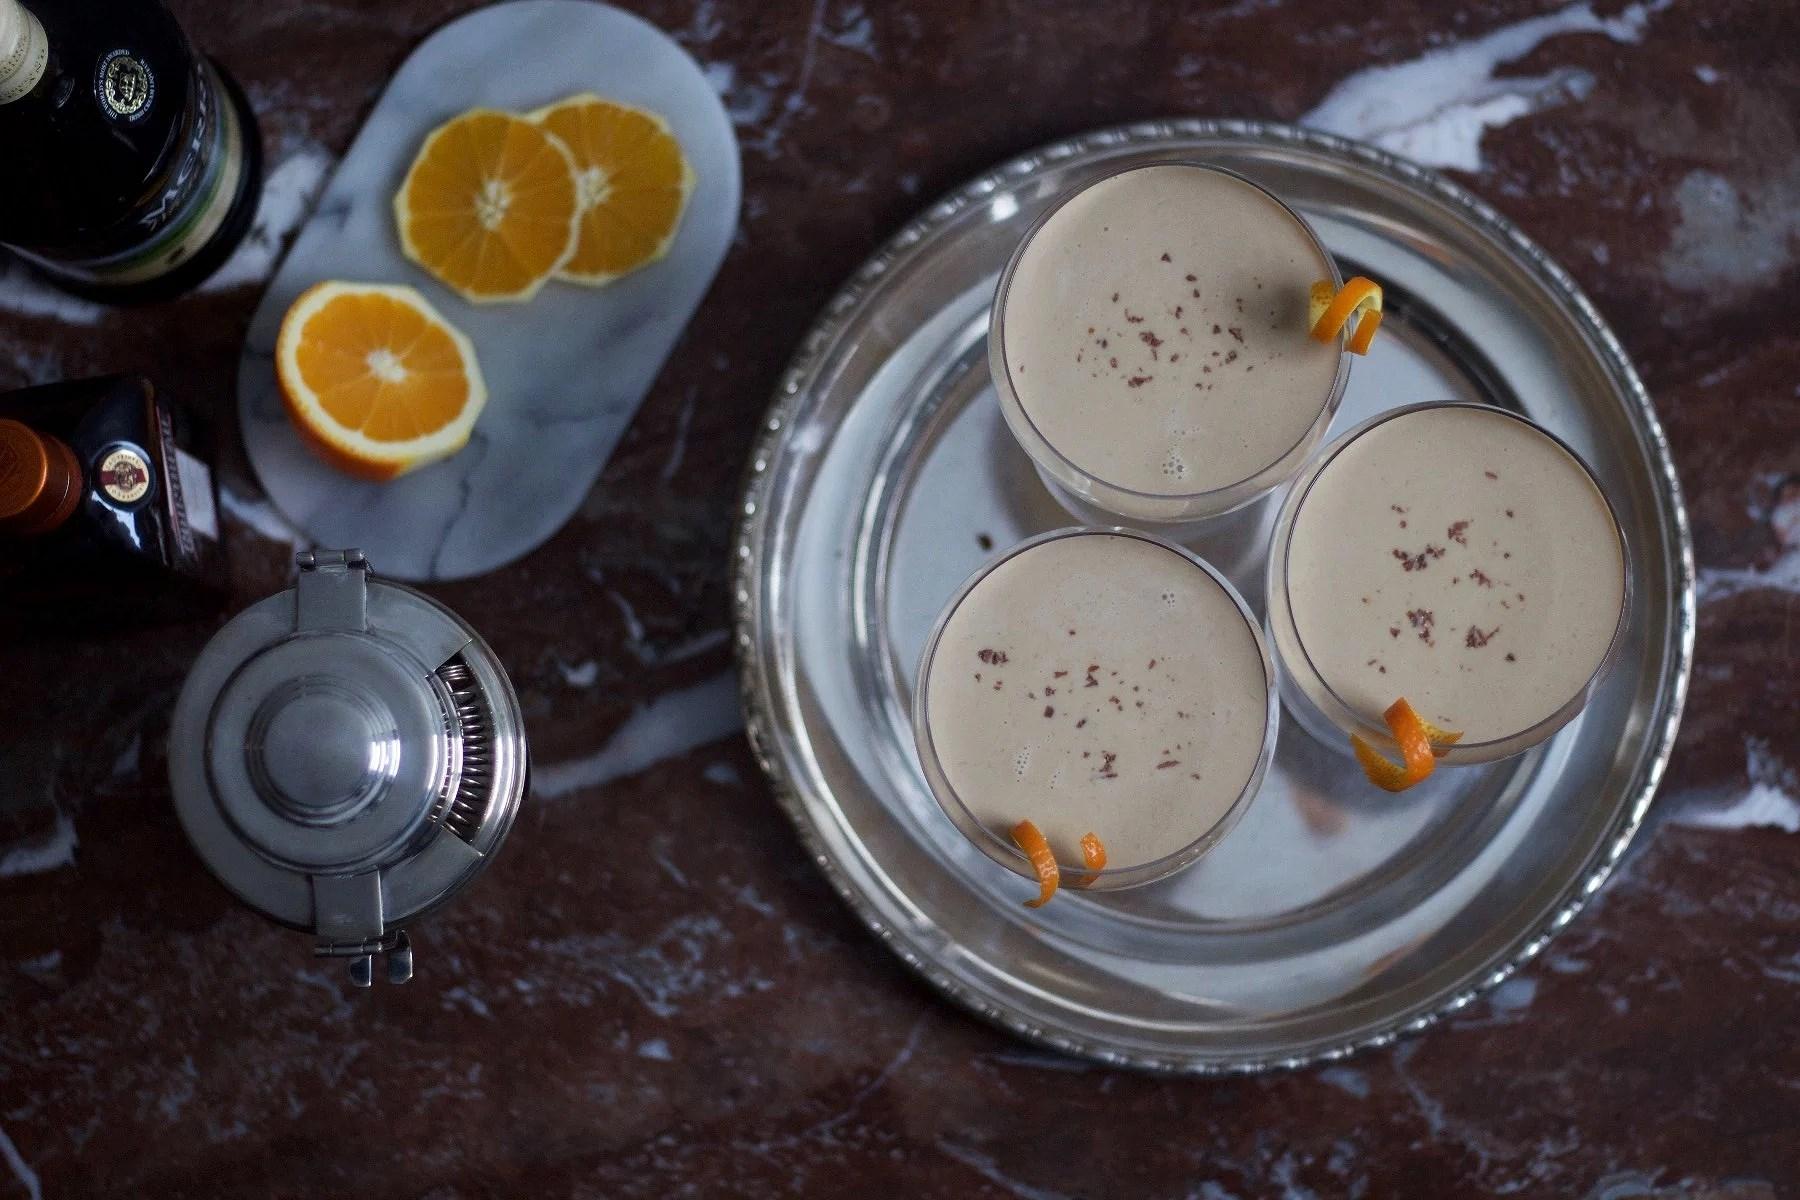 White chocolate, espresso & orange cocktail.